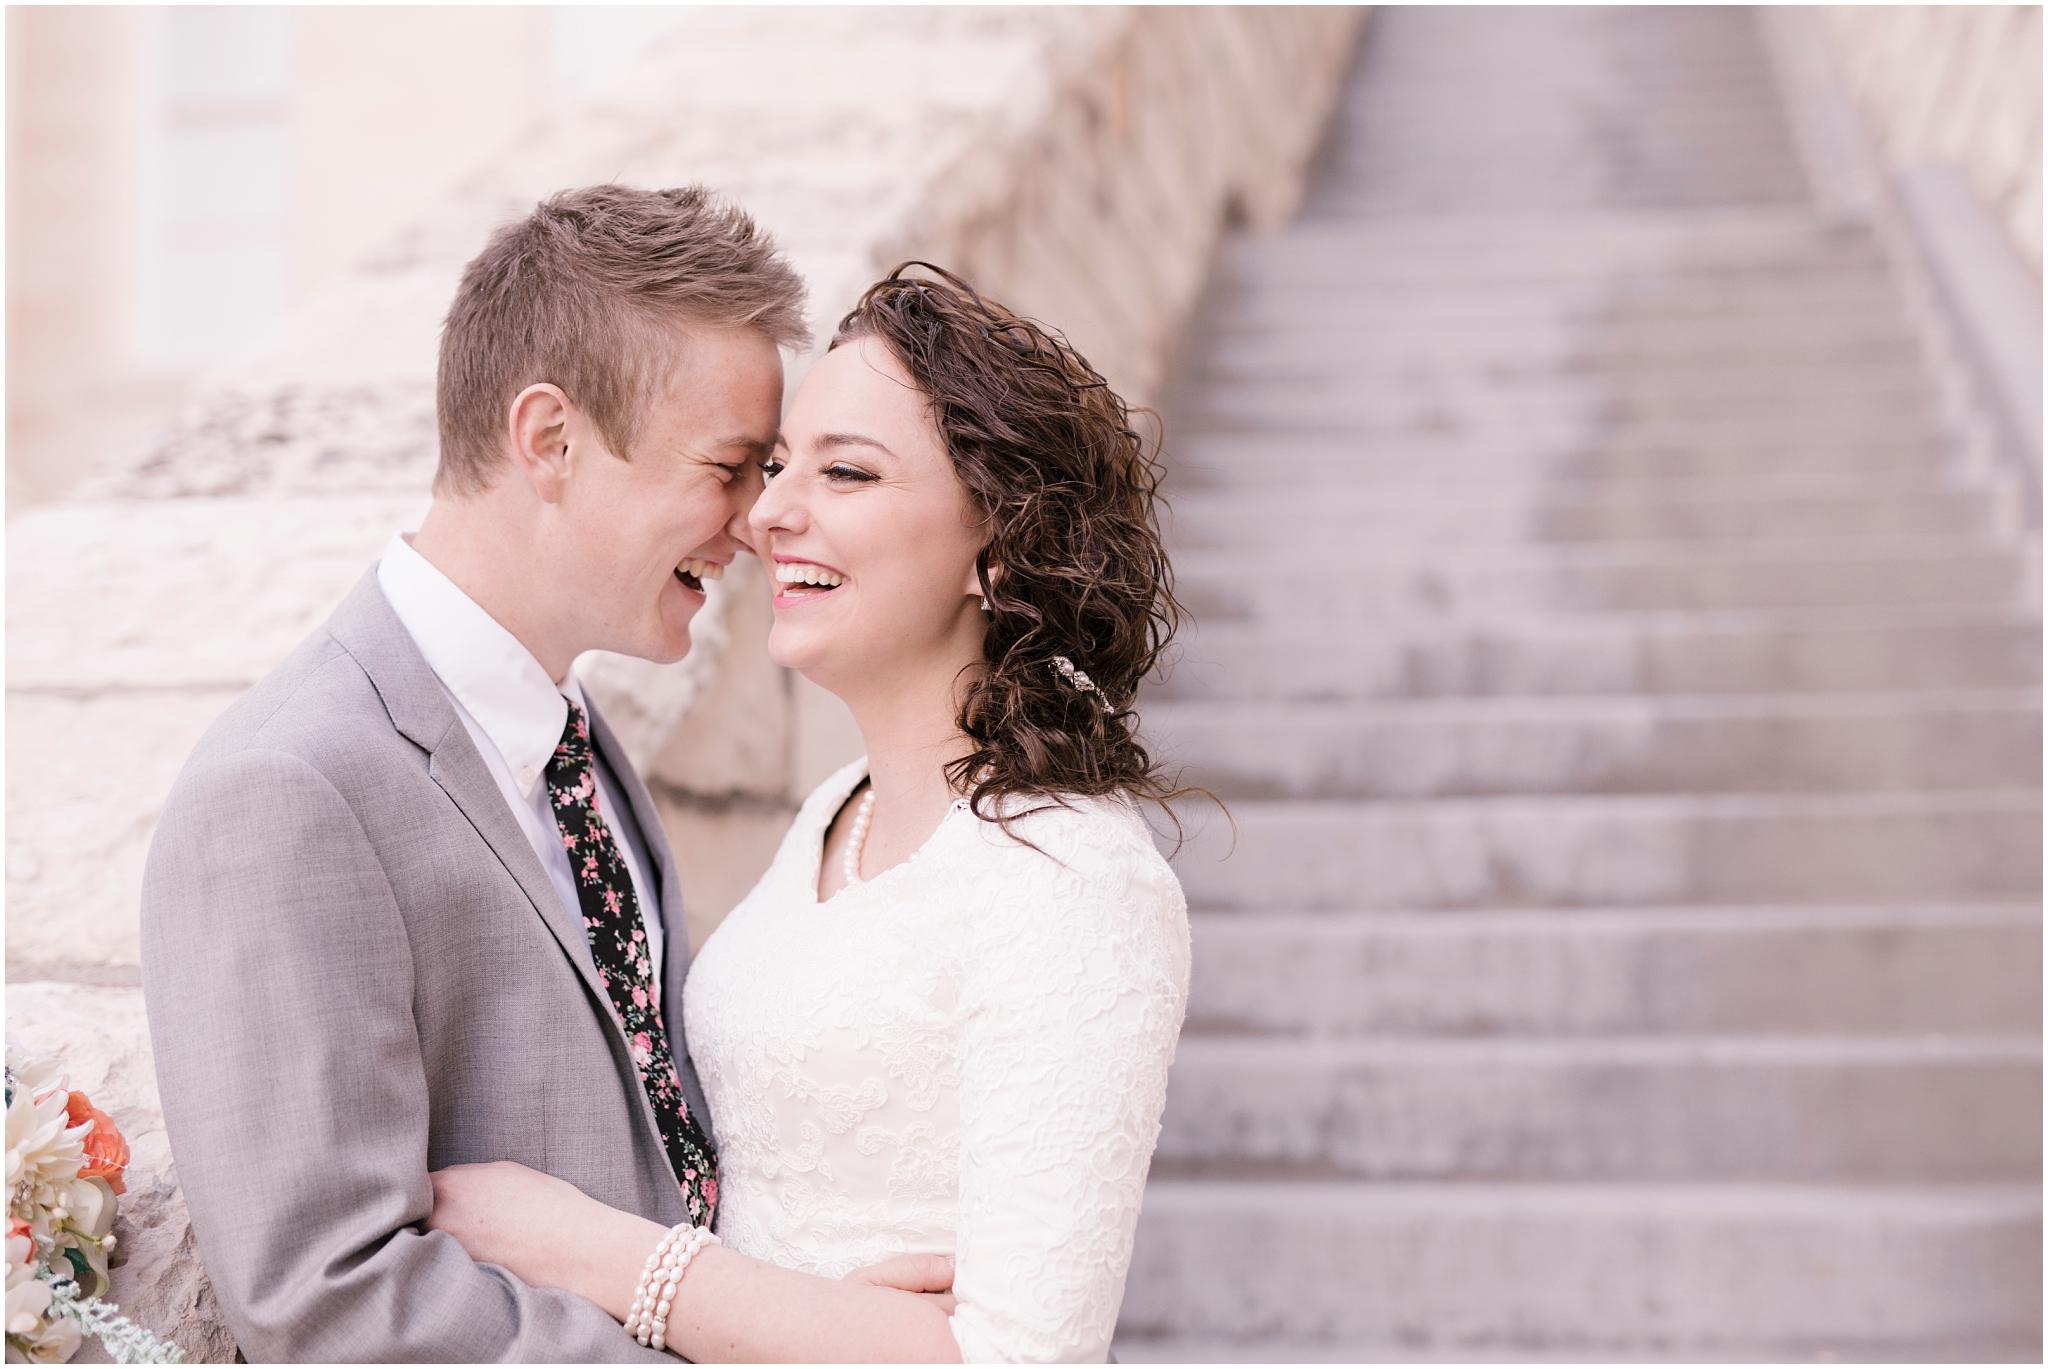 BA-Bridals-150_Lizzie-B-Imagery-Utah-Wedding-Photographer-Central-Utah-Photographer-Utah-County-Manti-Utah-Temple.jpg